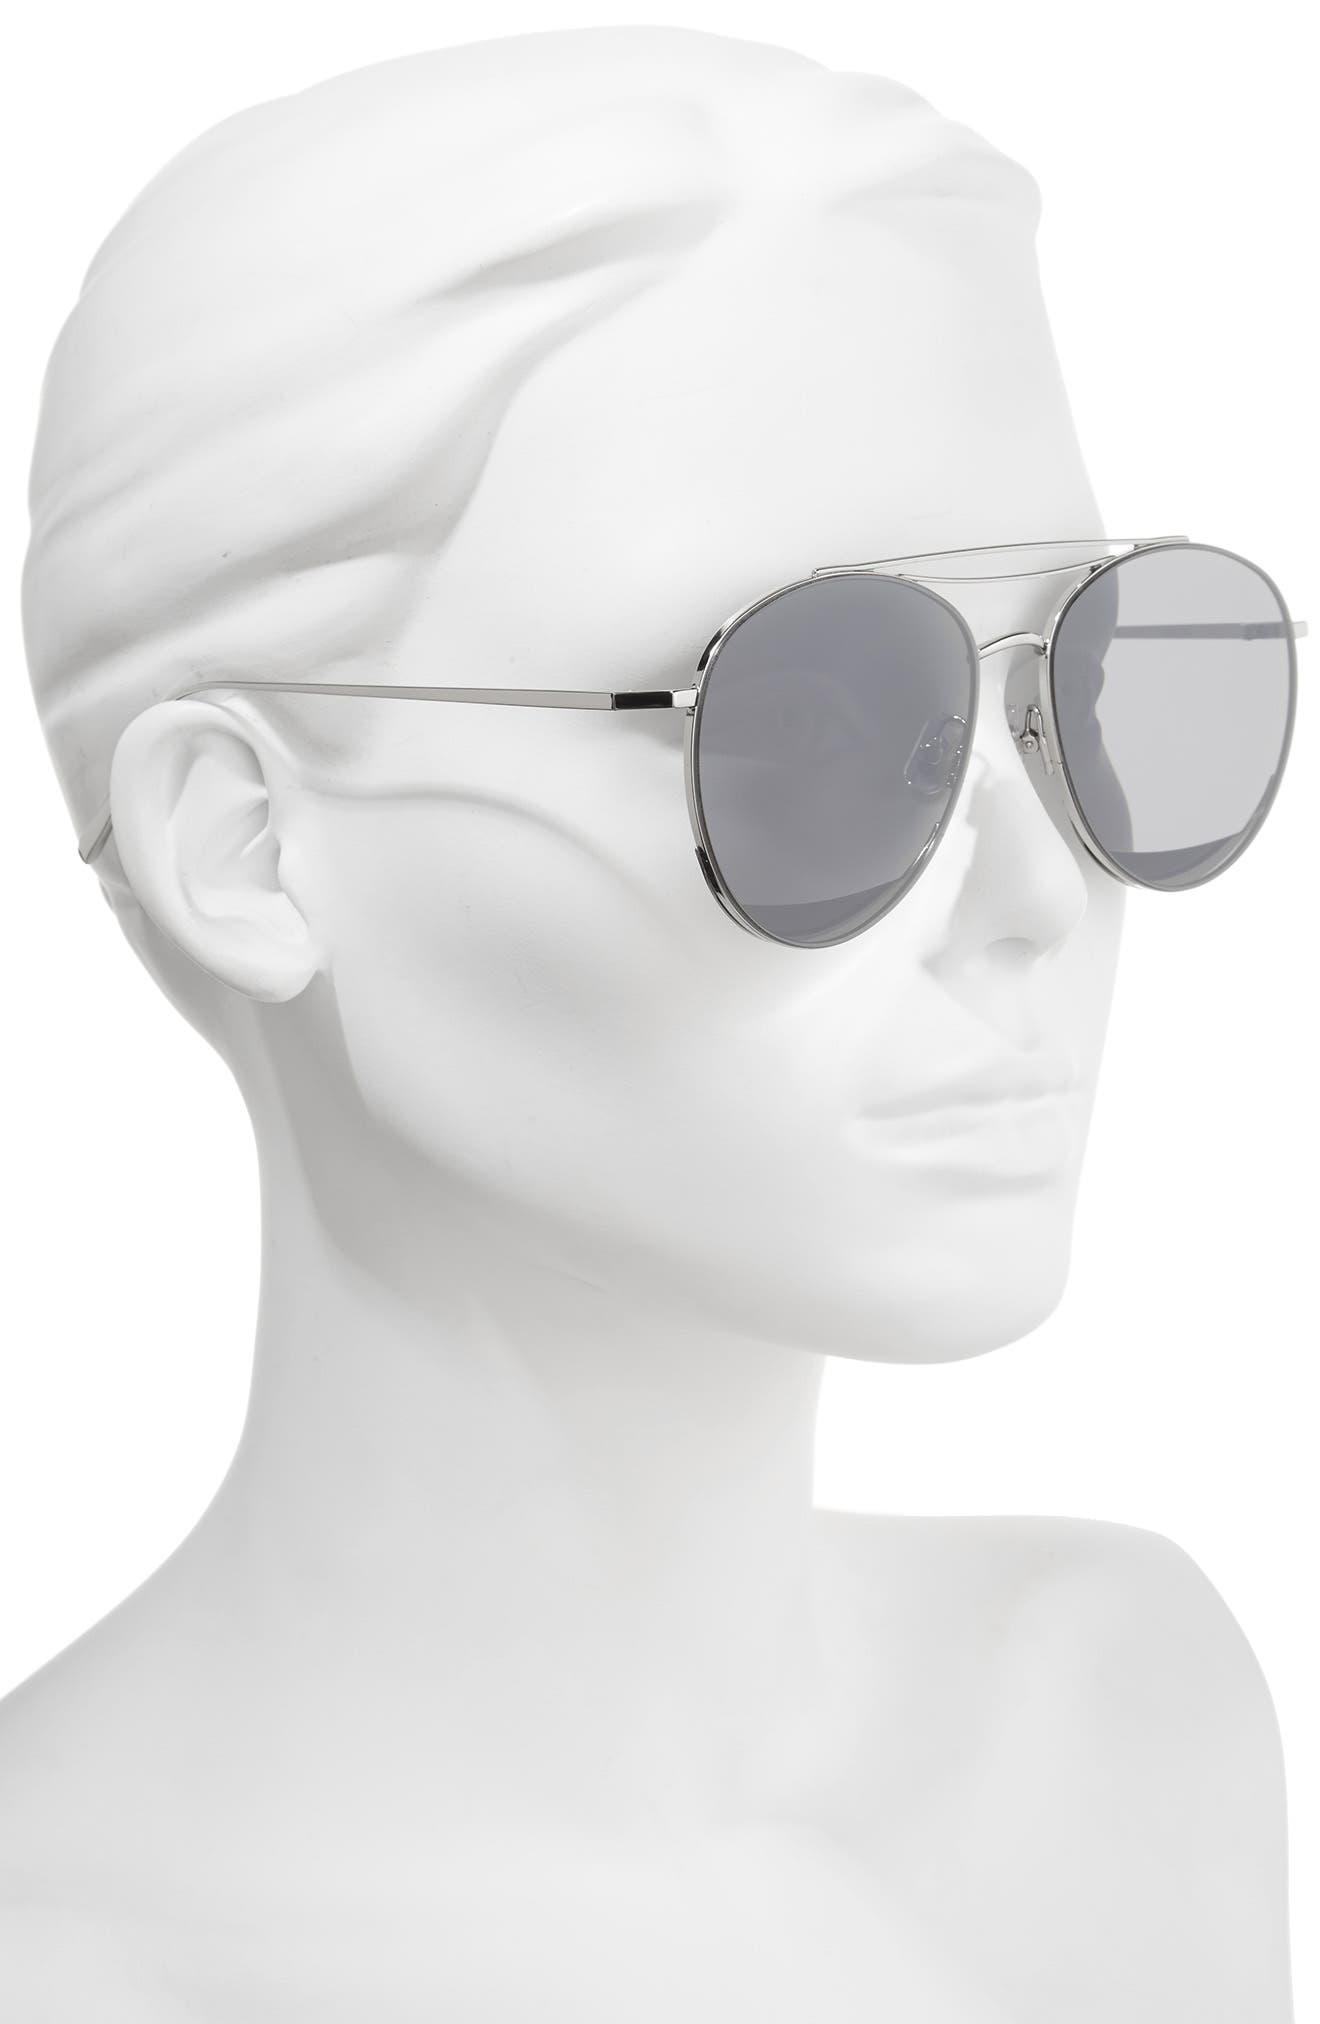 Odd Odd 61mm Aviator Sunglasses,                             Alternate thumbnail 2, color,                             040